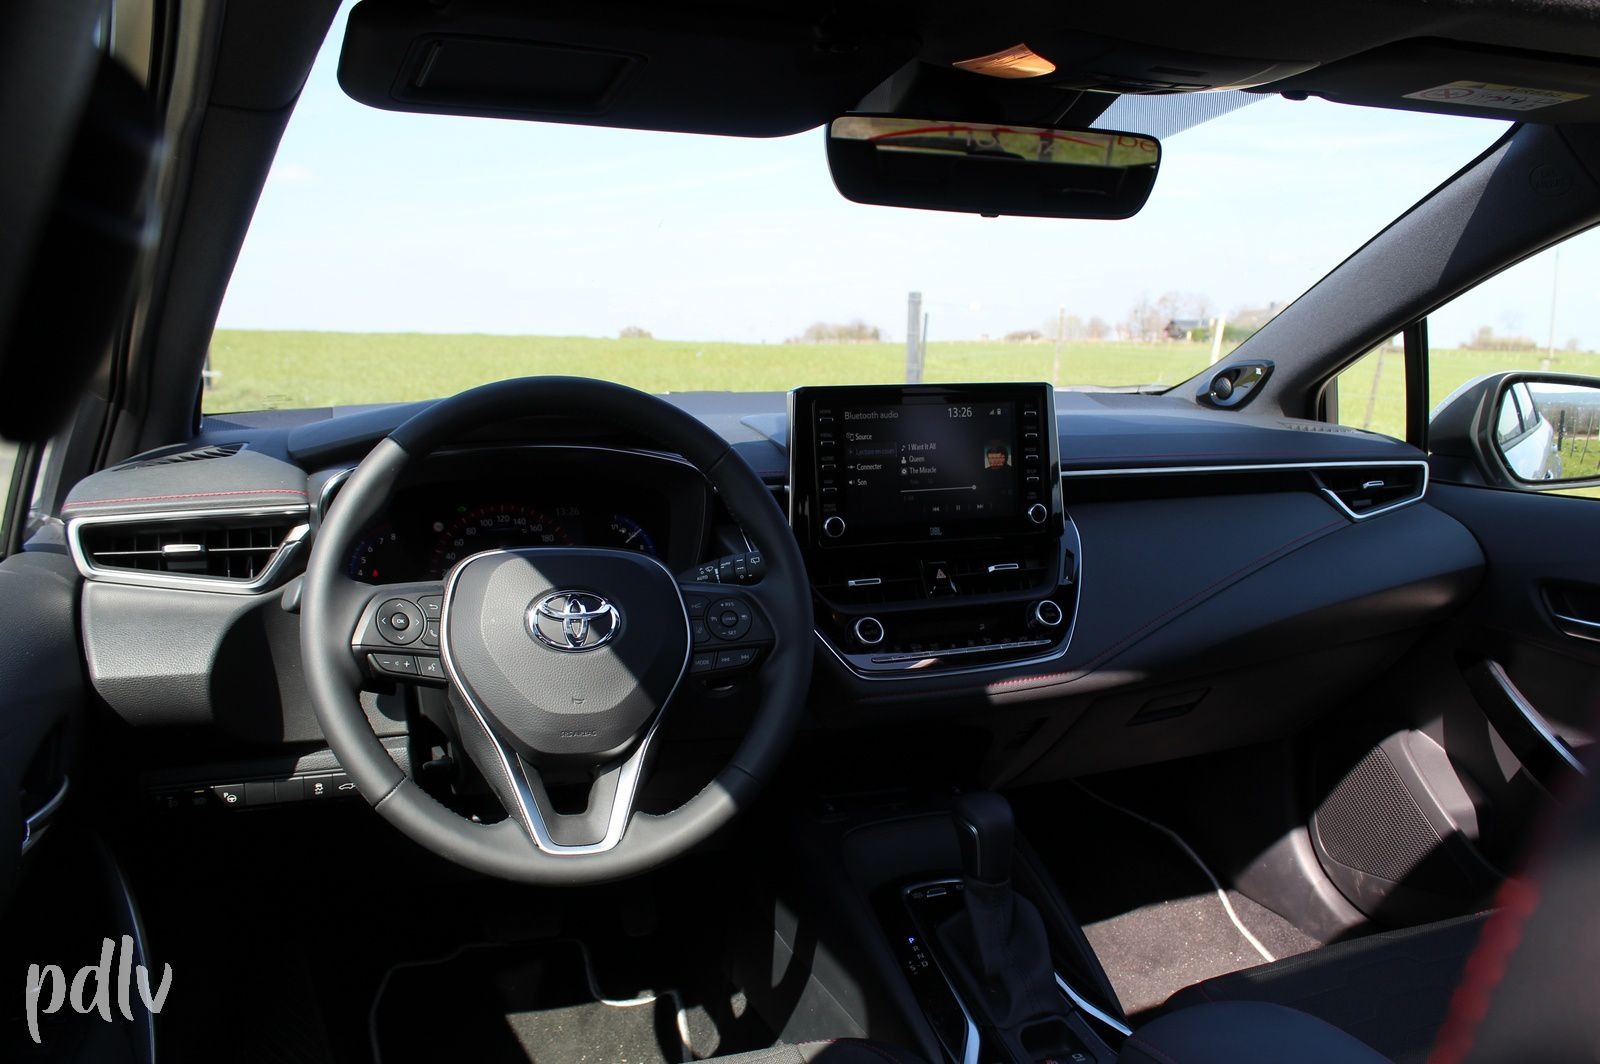 Toyota Corolla Touring Sports 2.0 Hybrid 180 : Bonne à tout faire